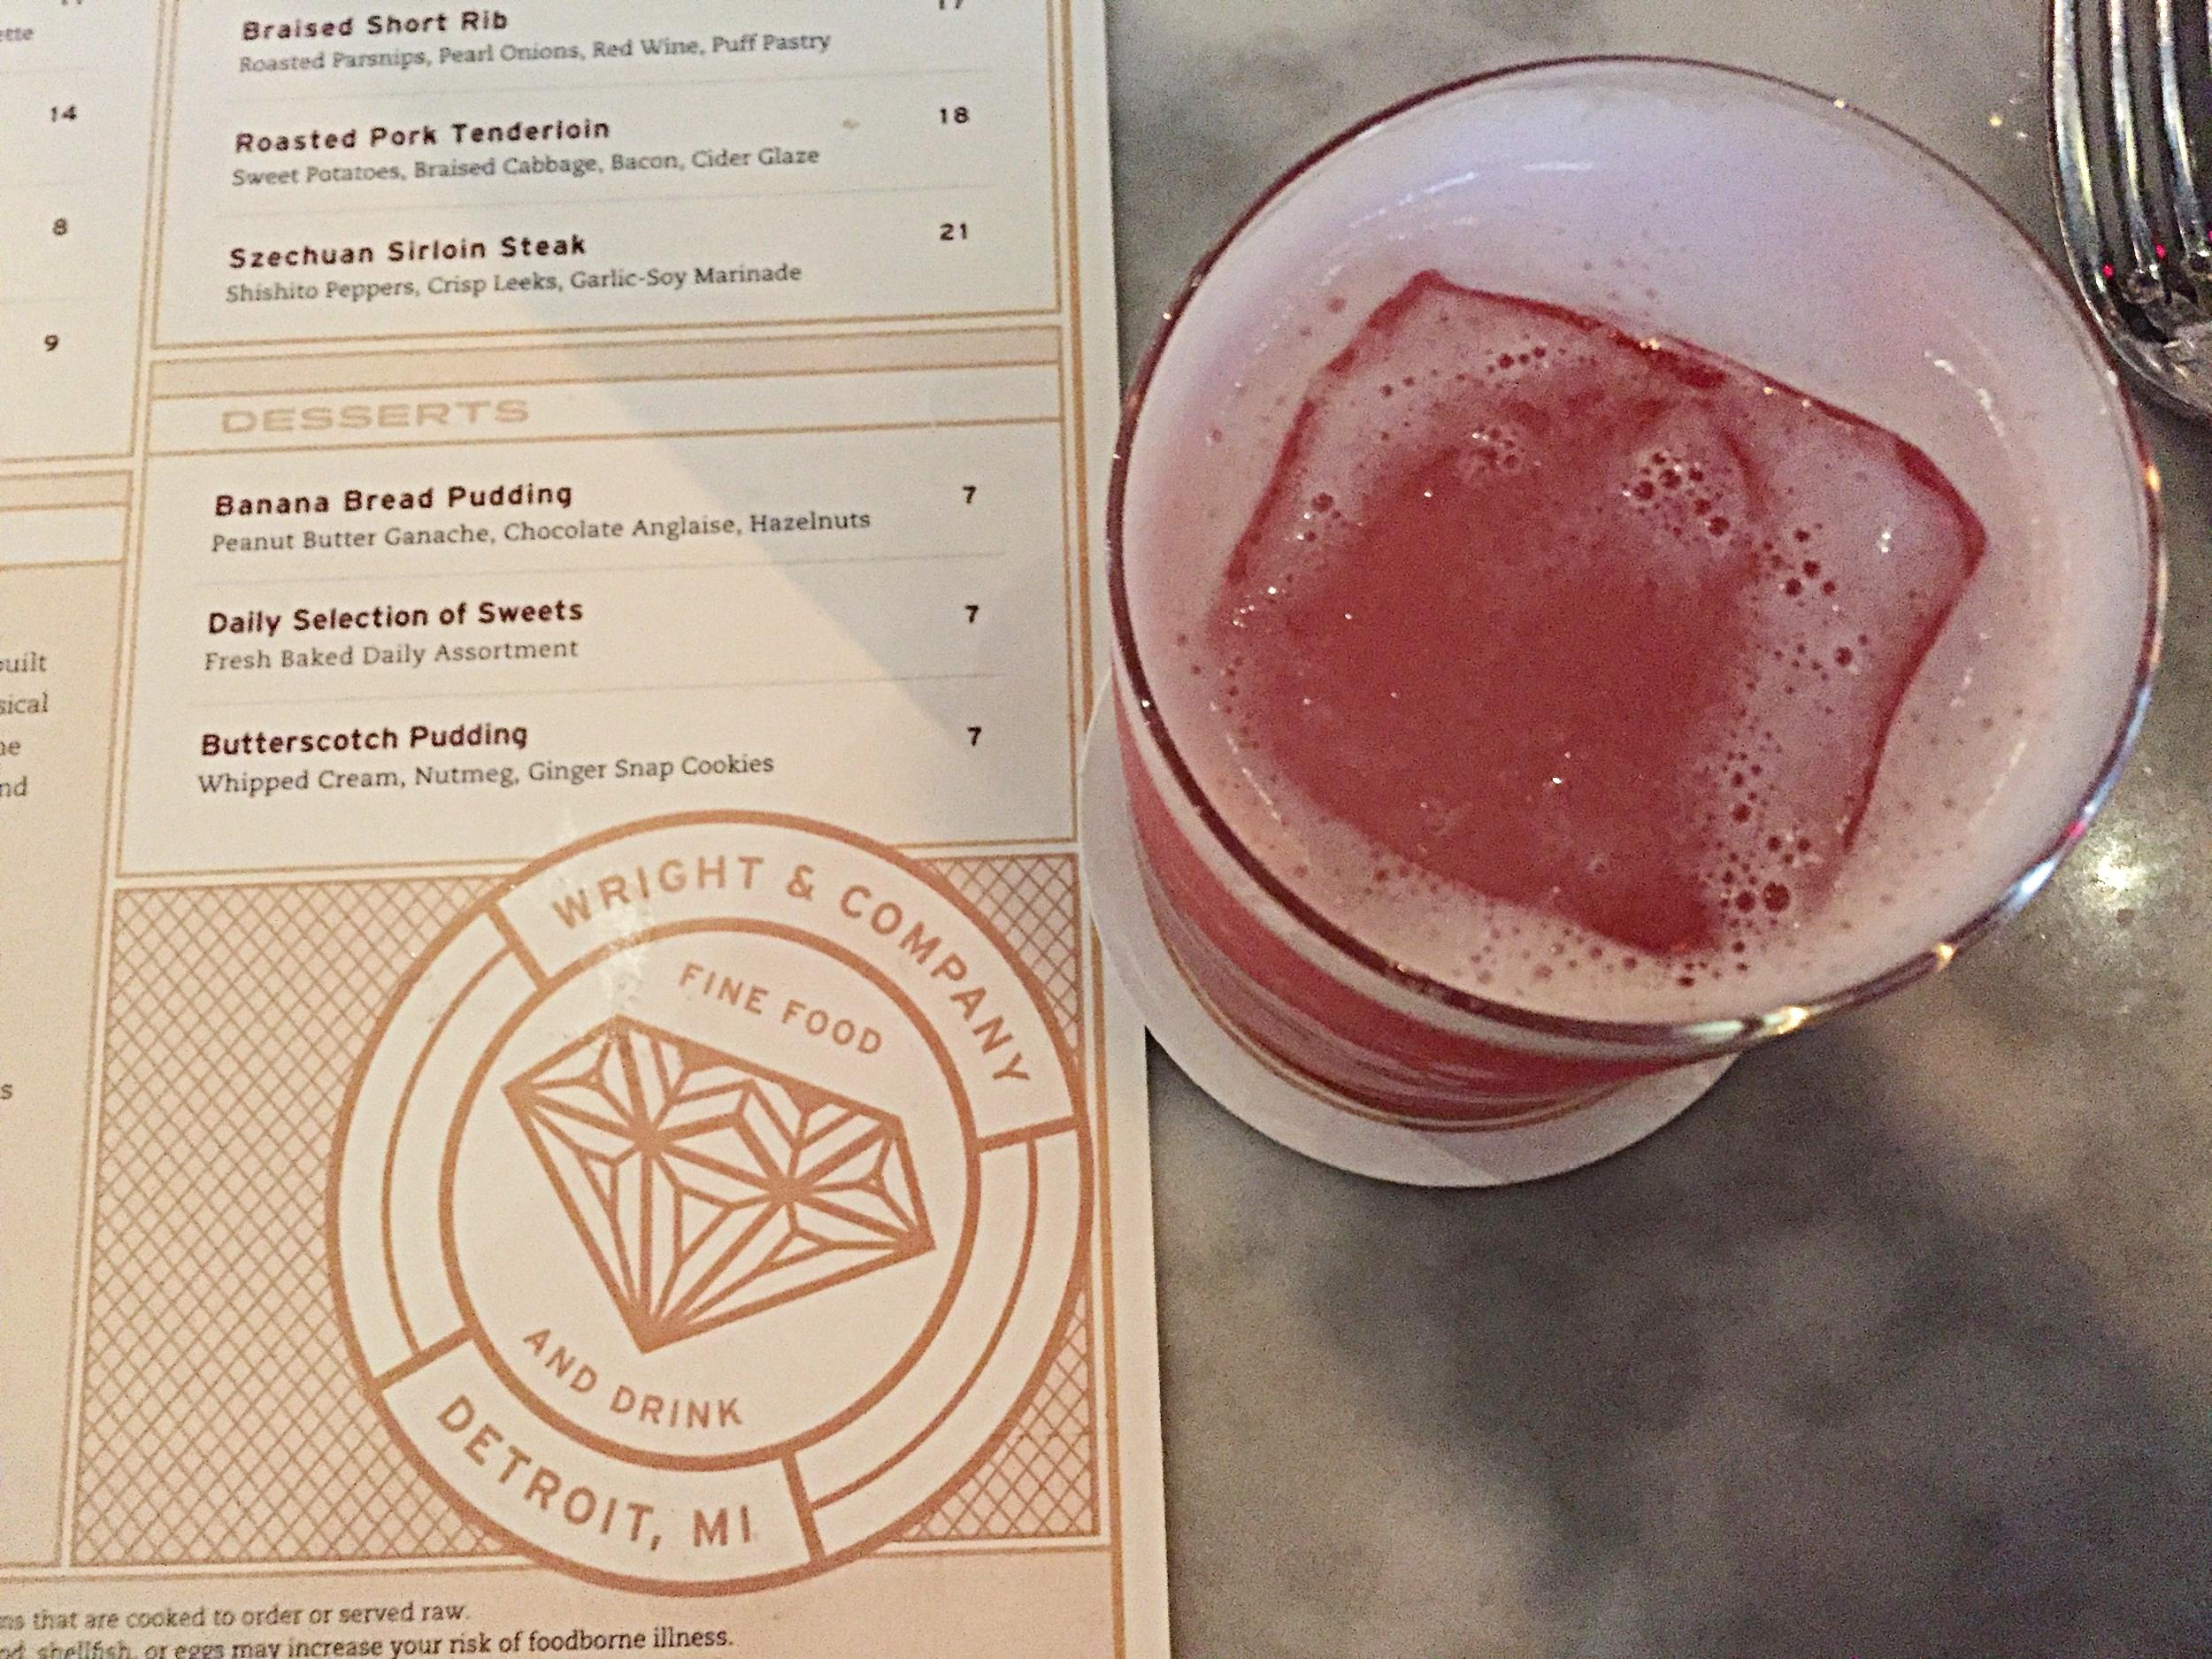 Hibiscus Sour cocktail